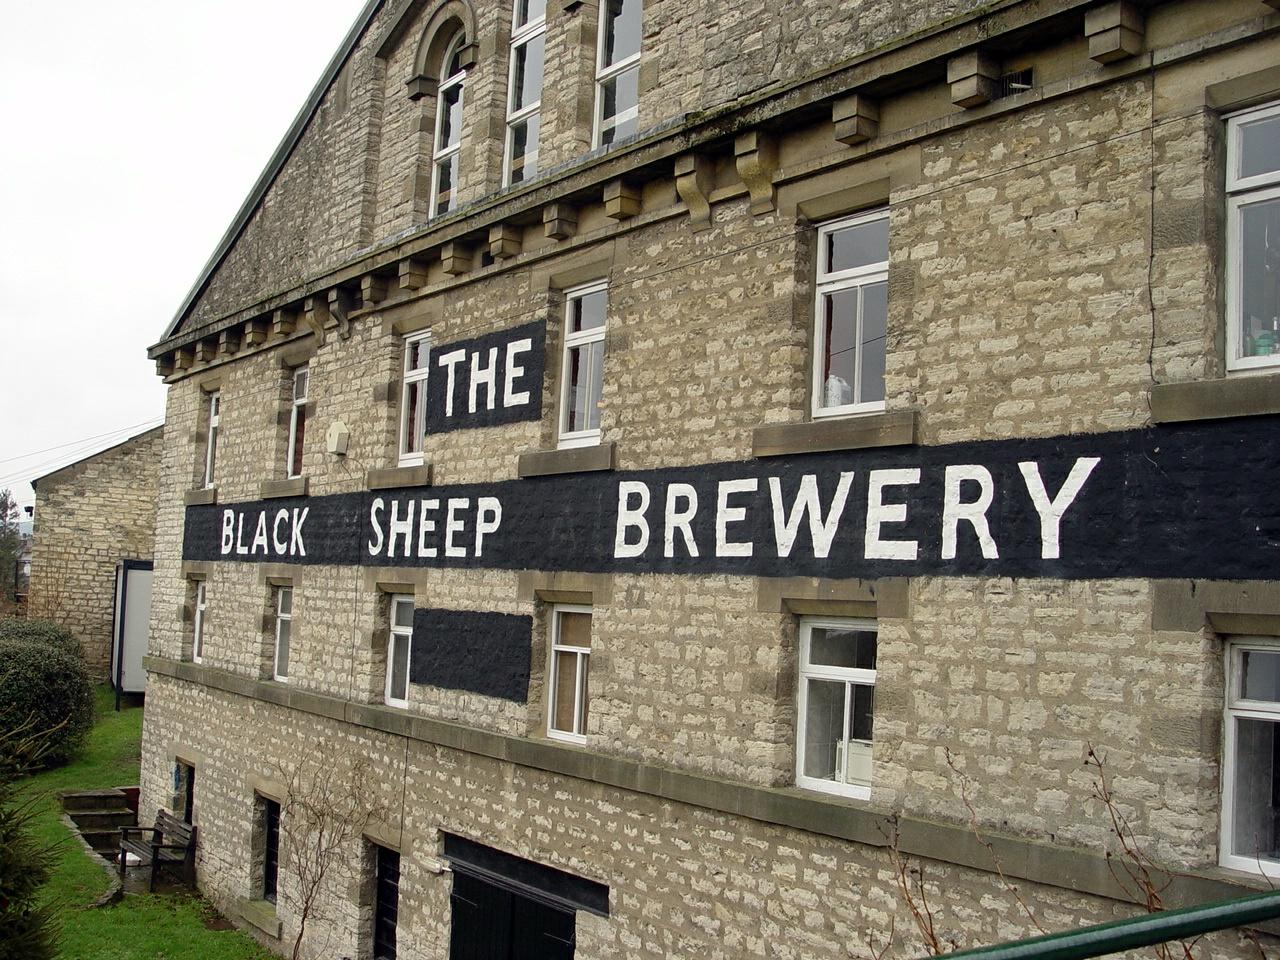 Black Sheep Brewery - Wikipedia